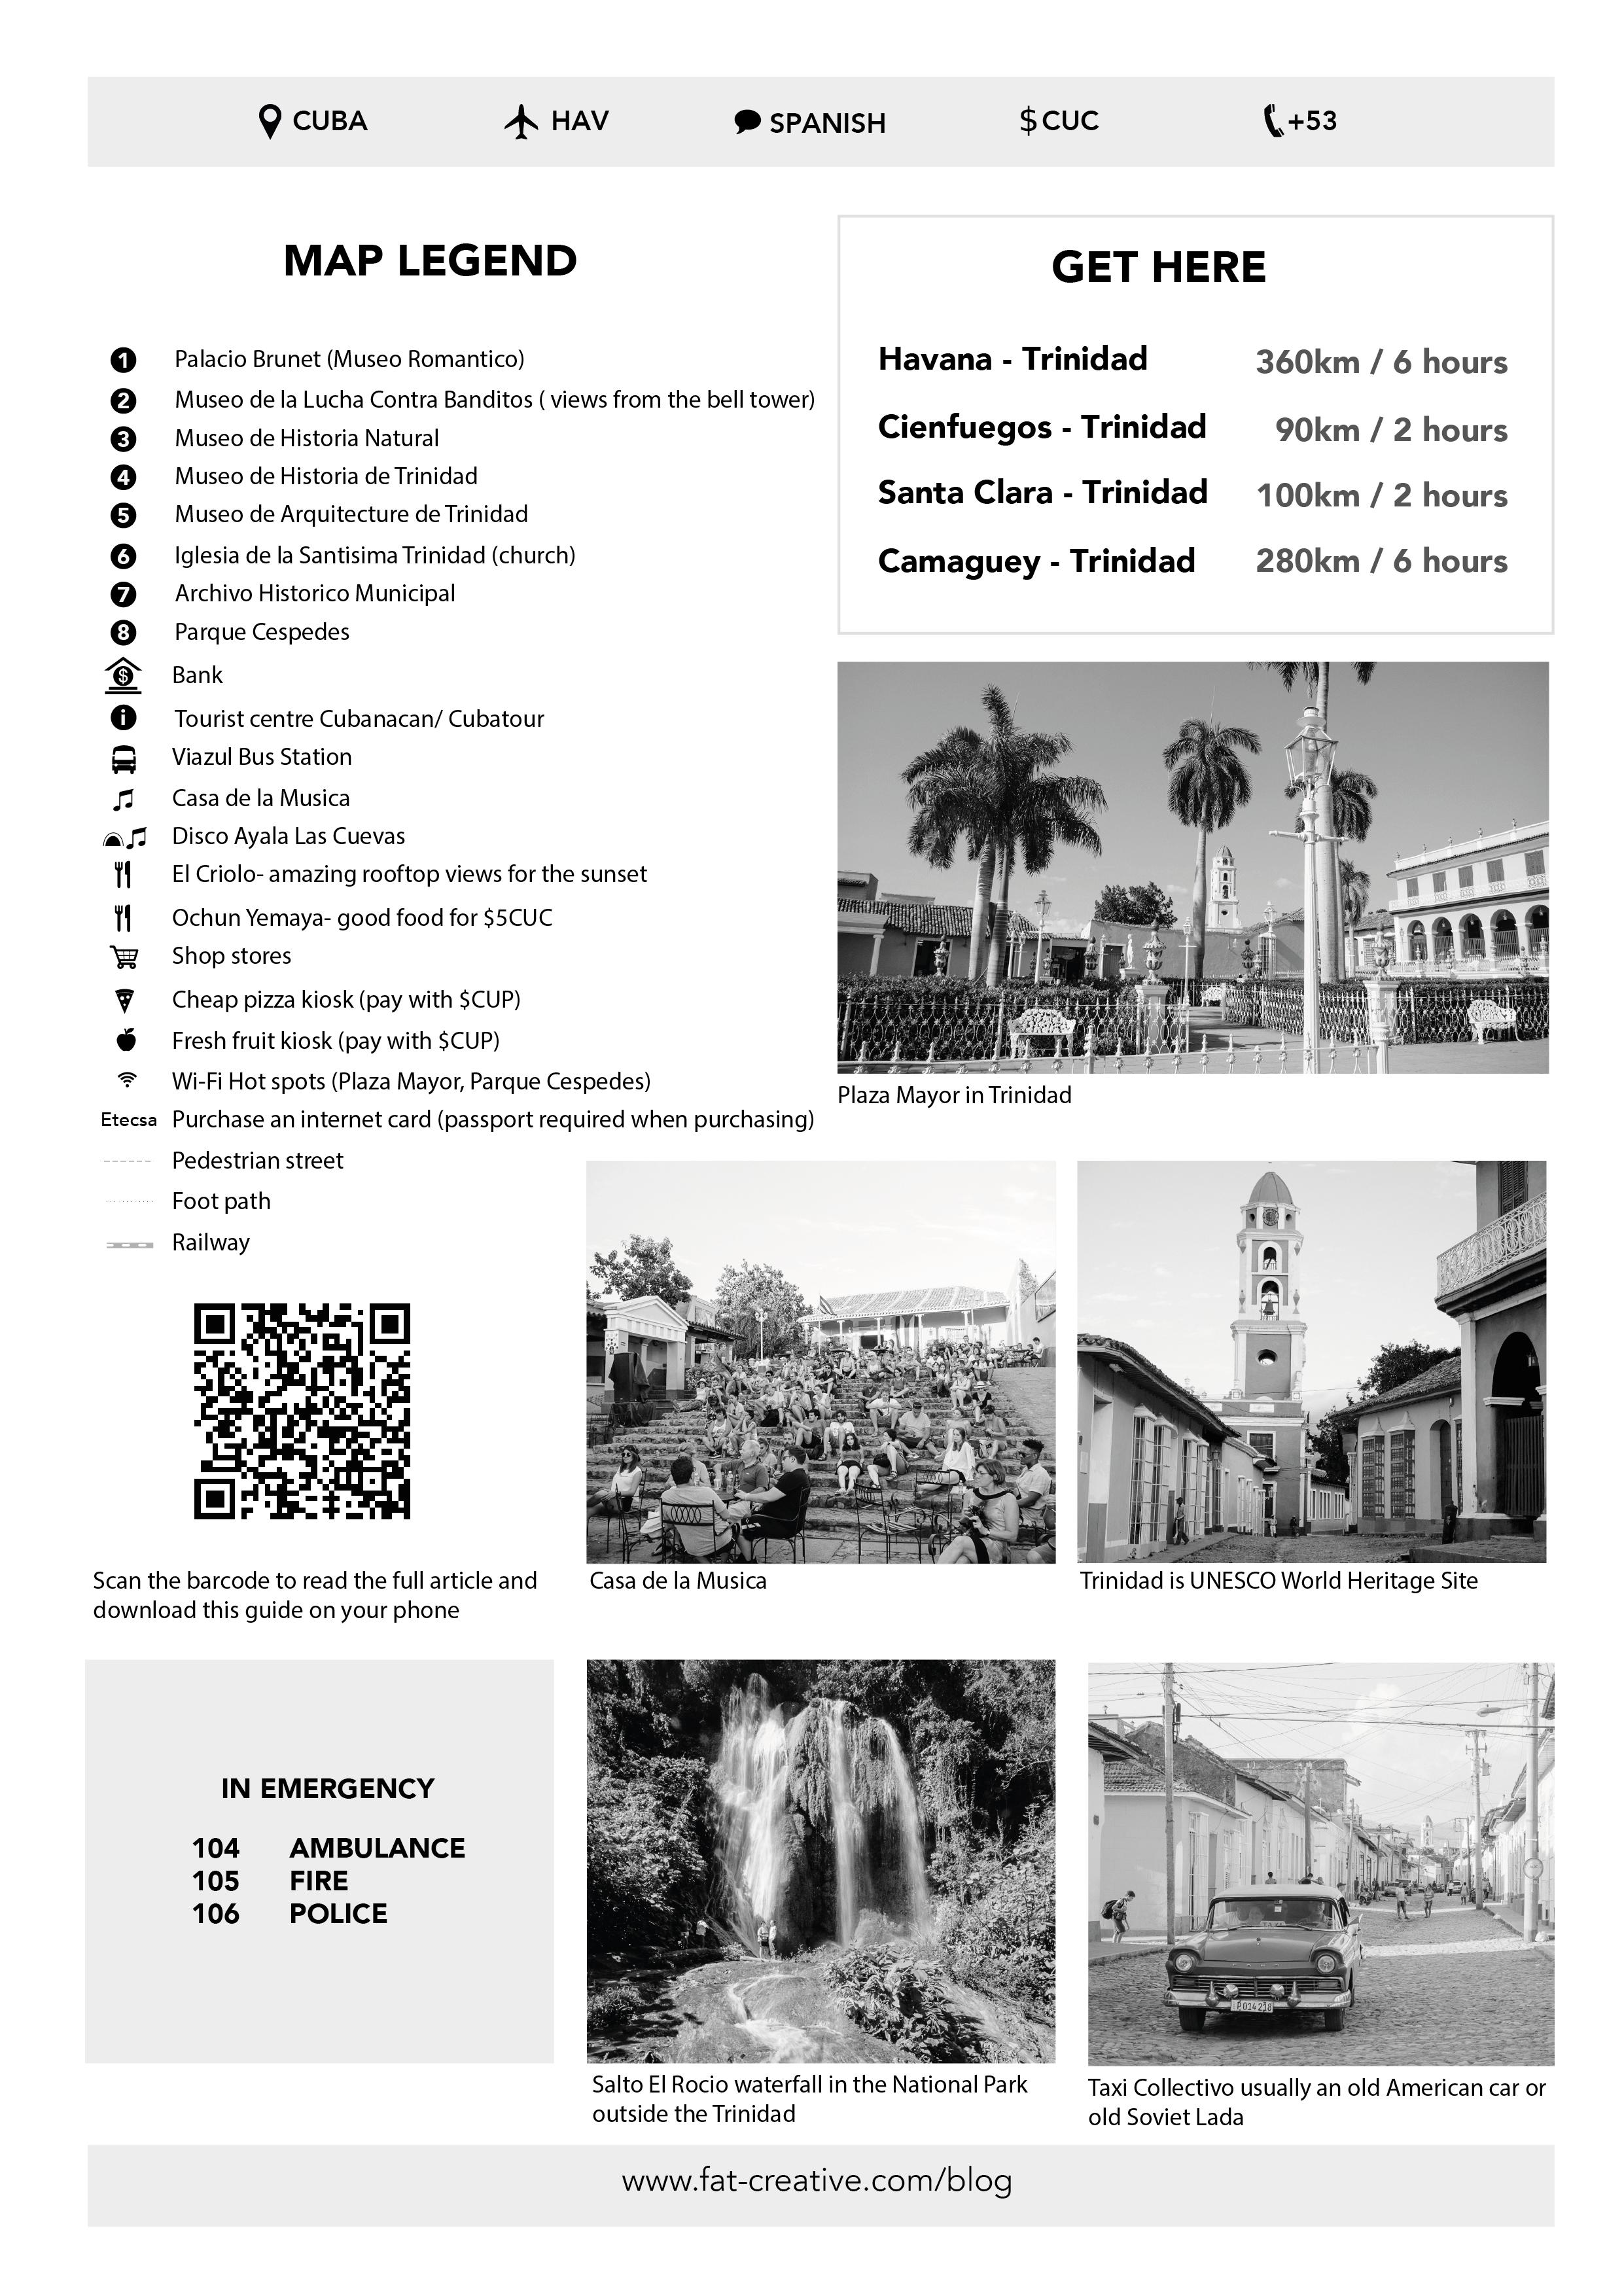 Trinidad-map-00-02.png